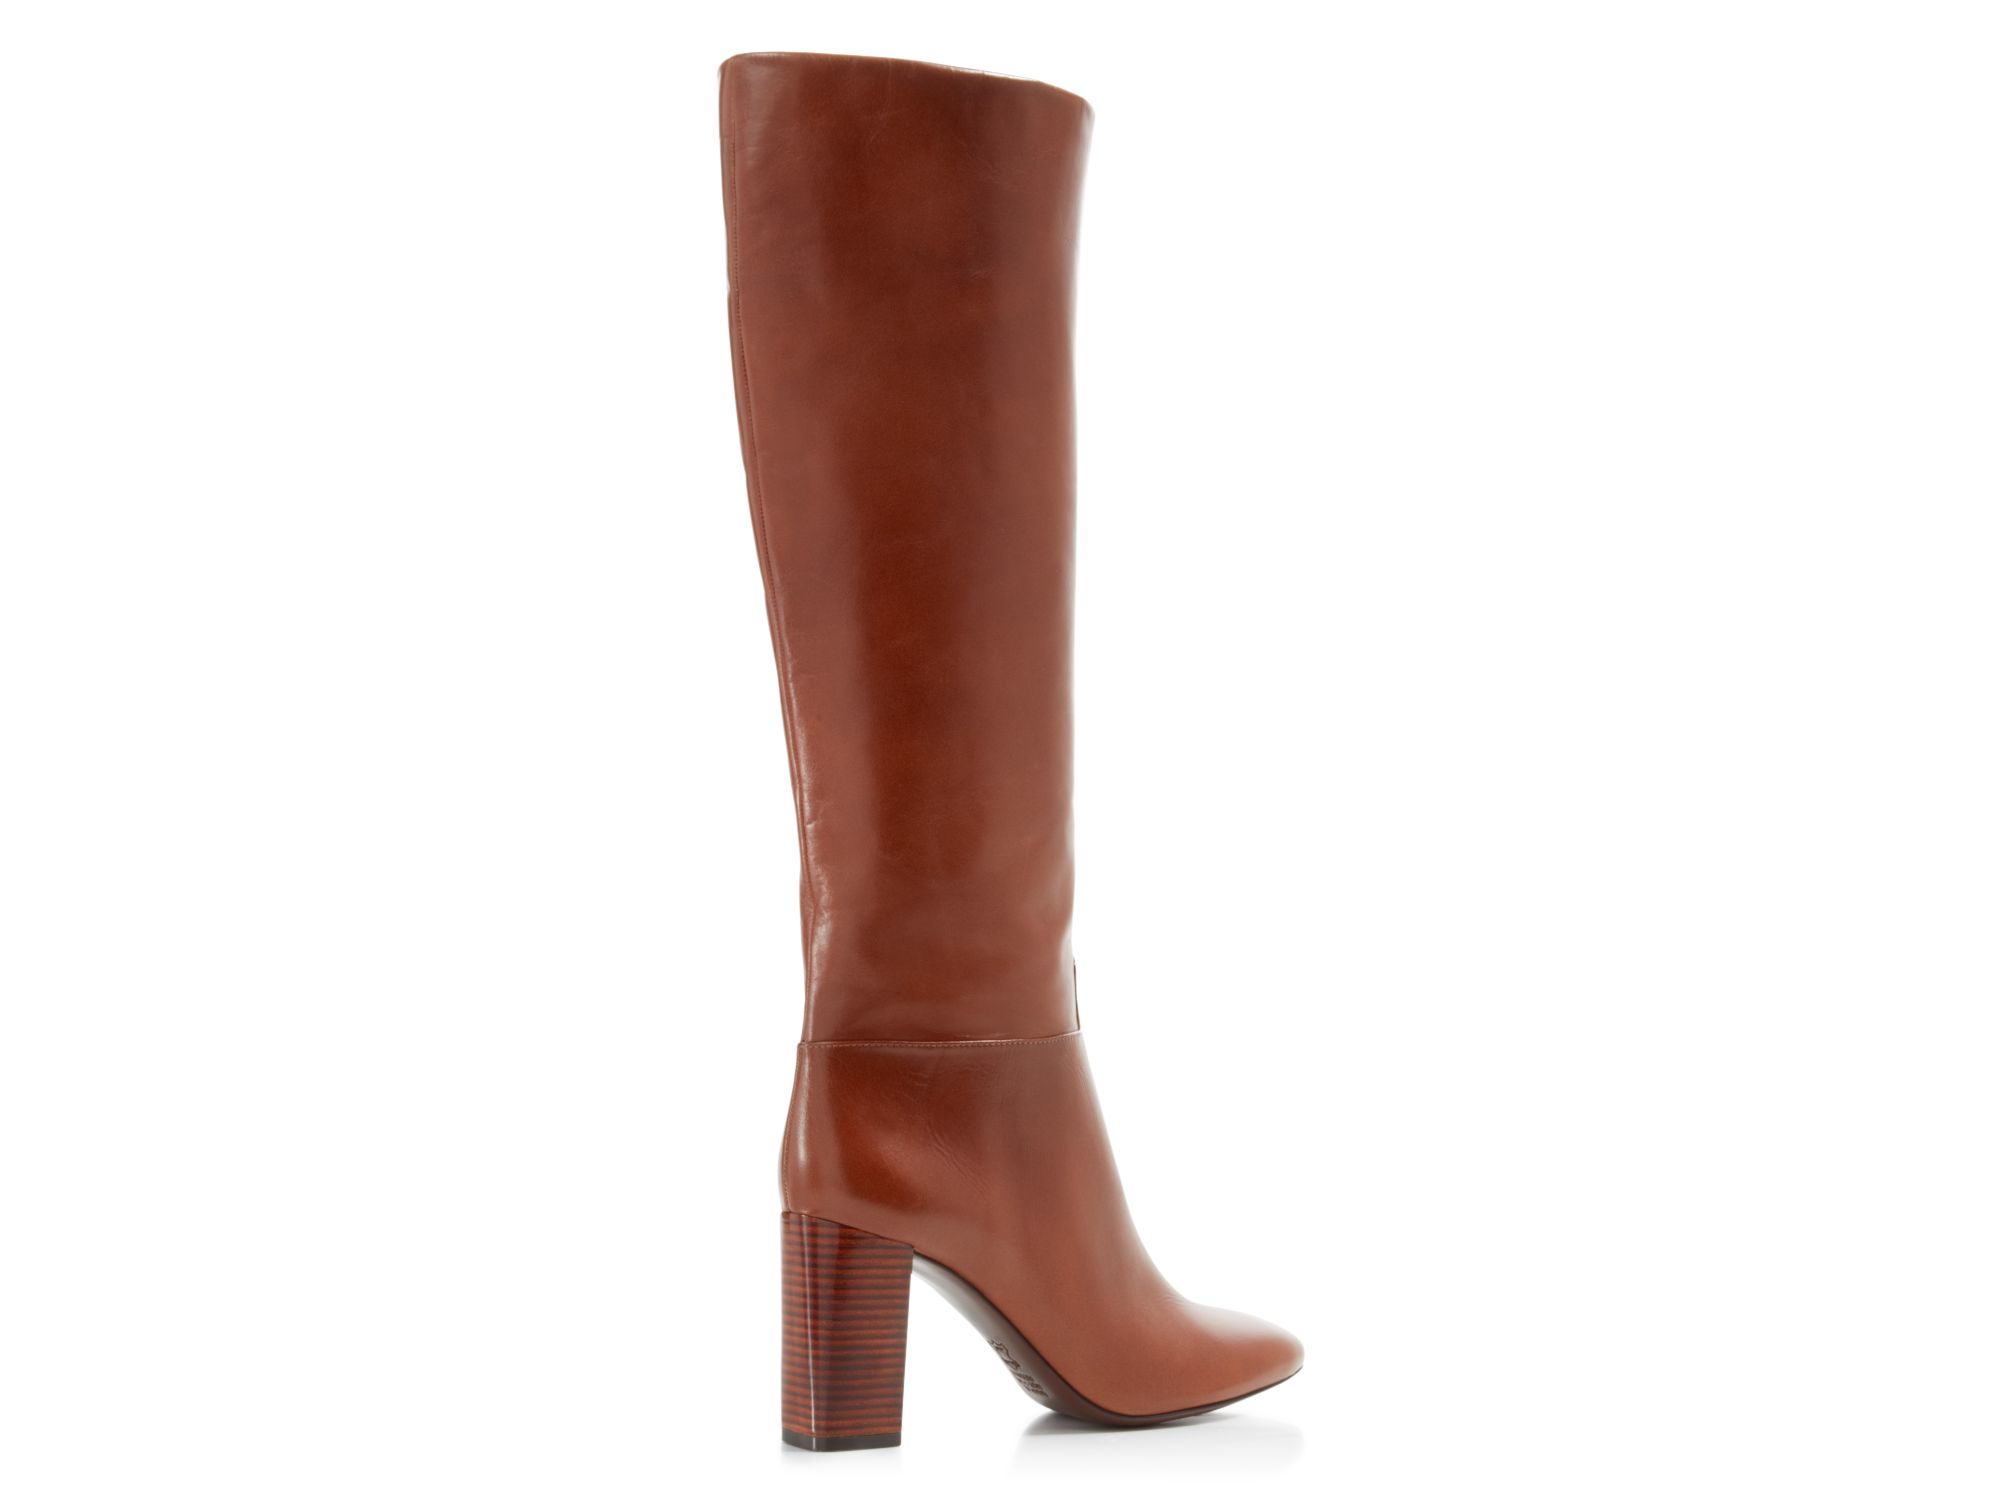 460704349d0 Lyst - Tory Burch Devon High Heel Tall Boots in Brown